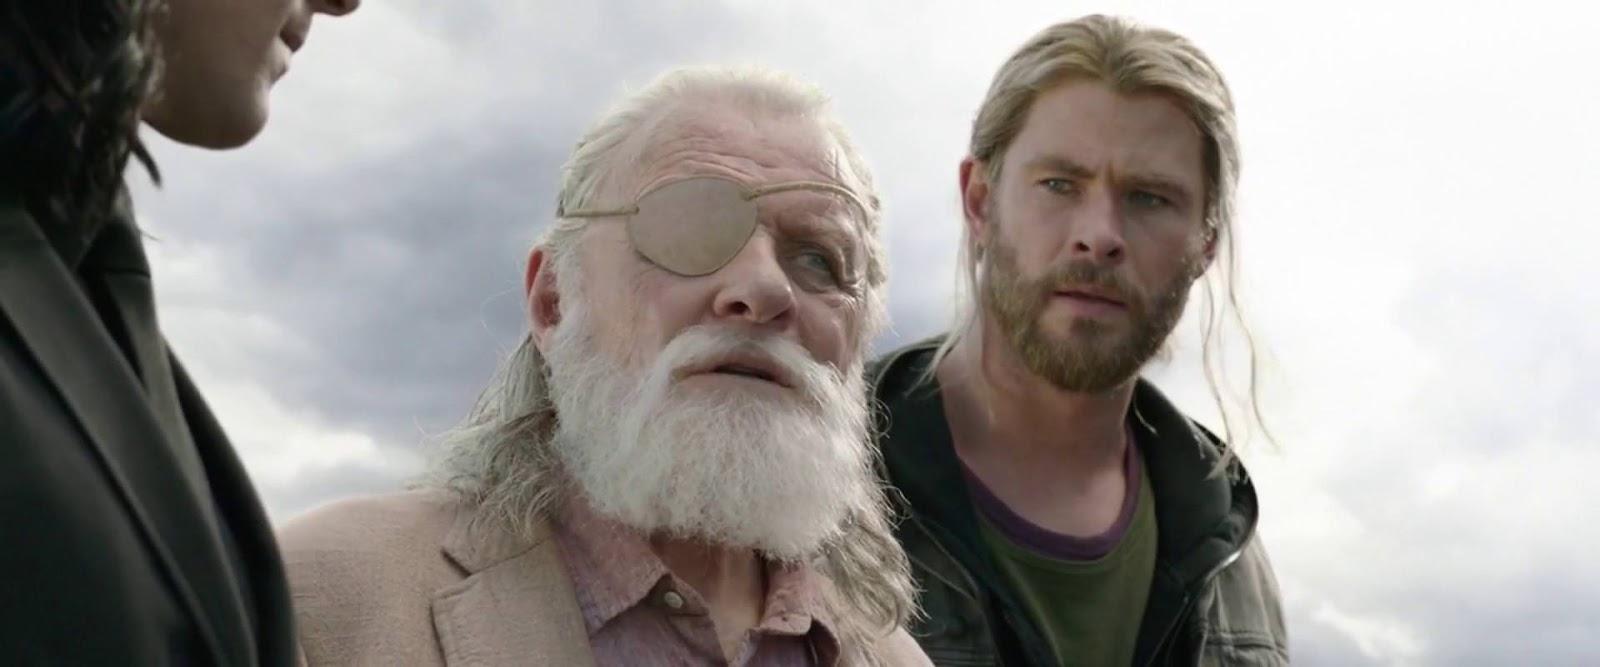 Screen Shoot of Thor Ragnarok (2017) Full Hindi Movie Download Dual Audio Hd Watch Free Online in English